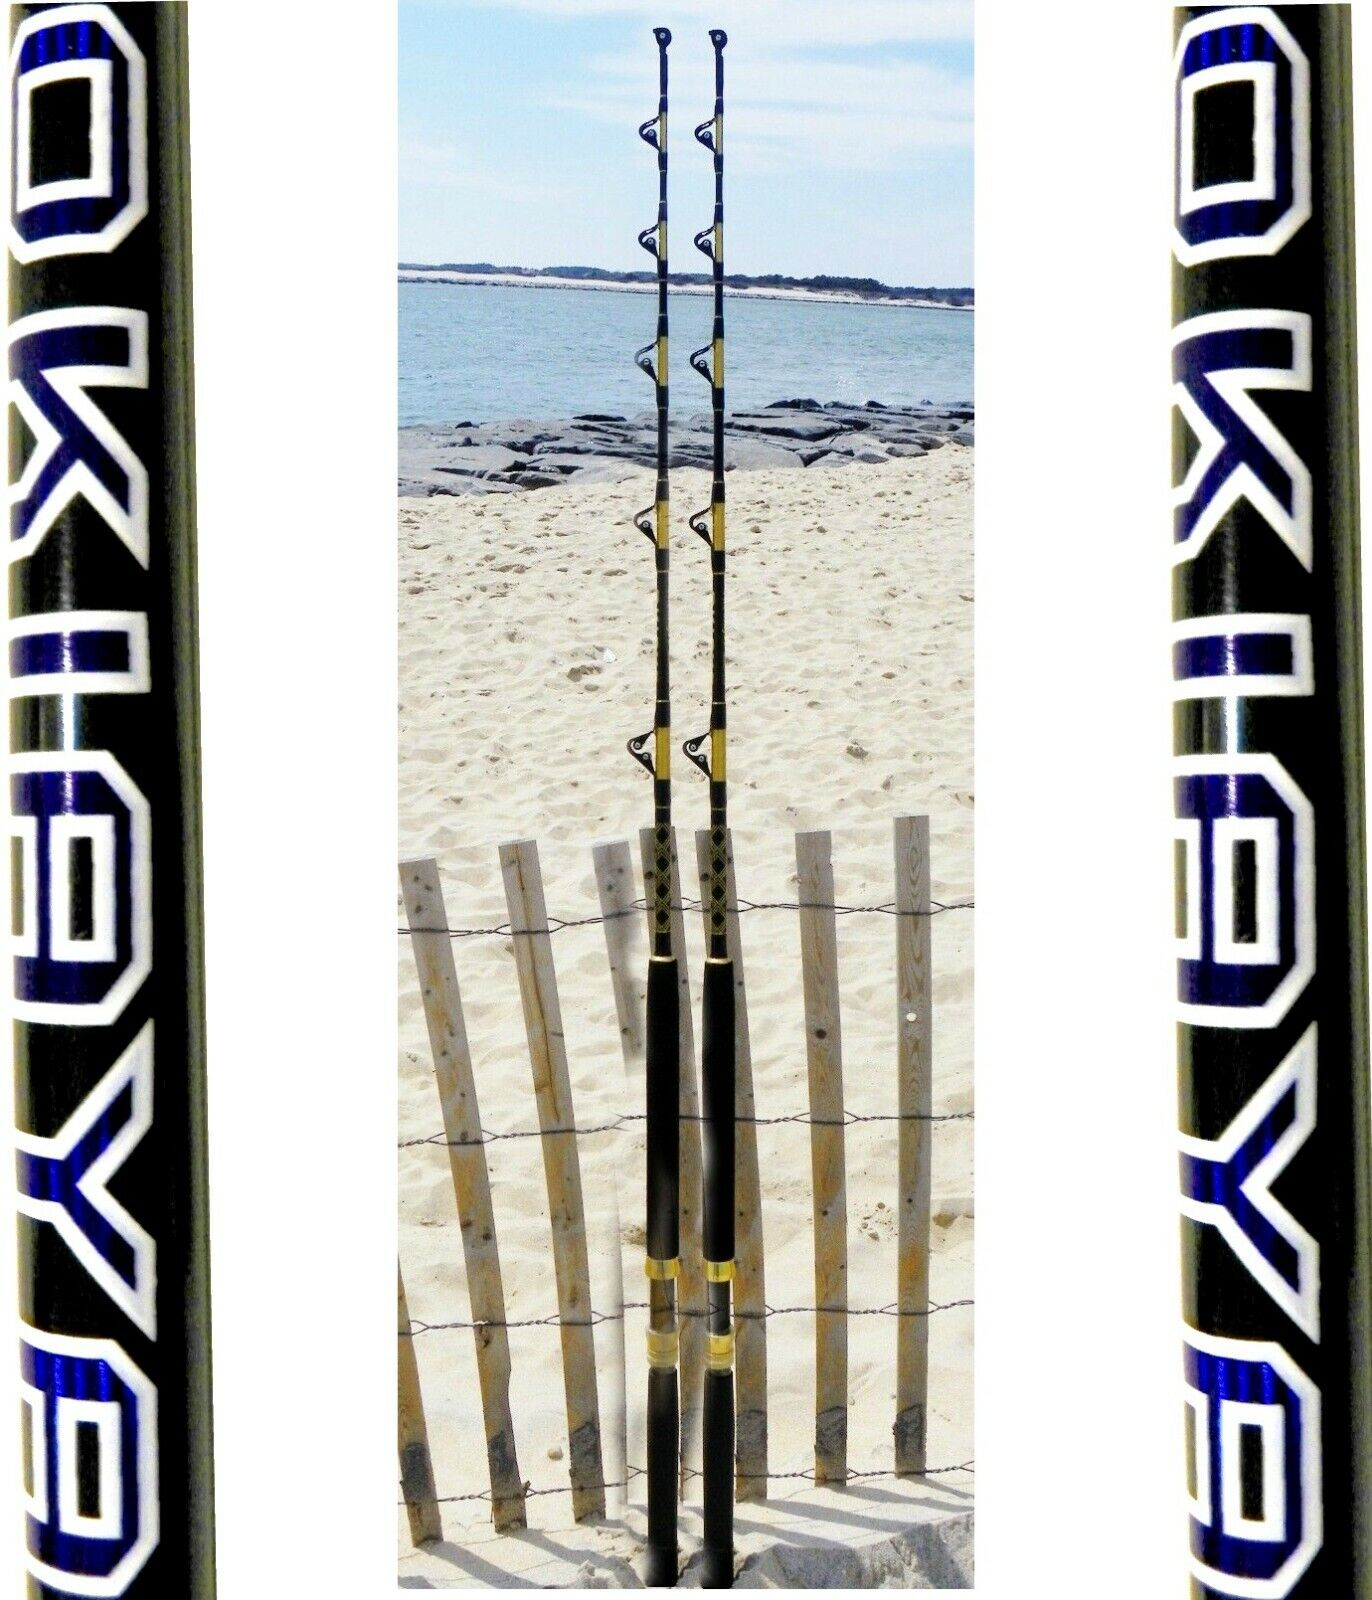 Okiaya Composit 30-50lb Agua Salada Grandes Juego Roller Rod Set De 2